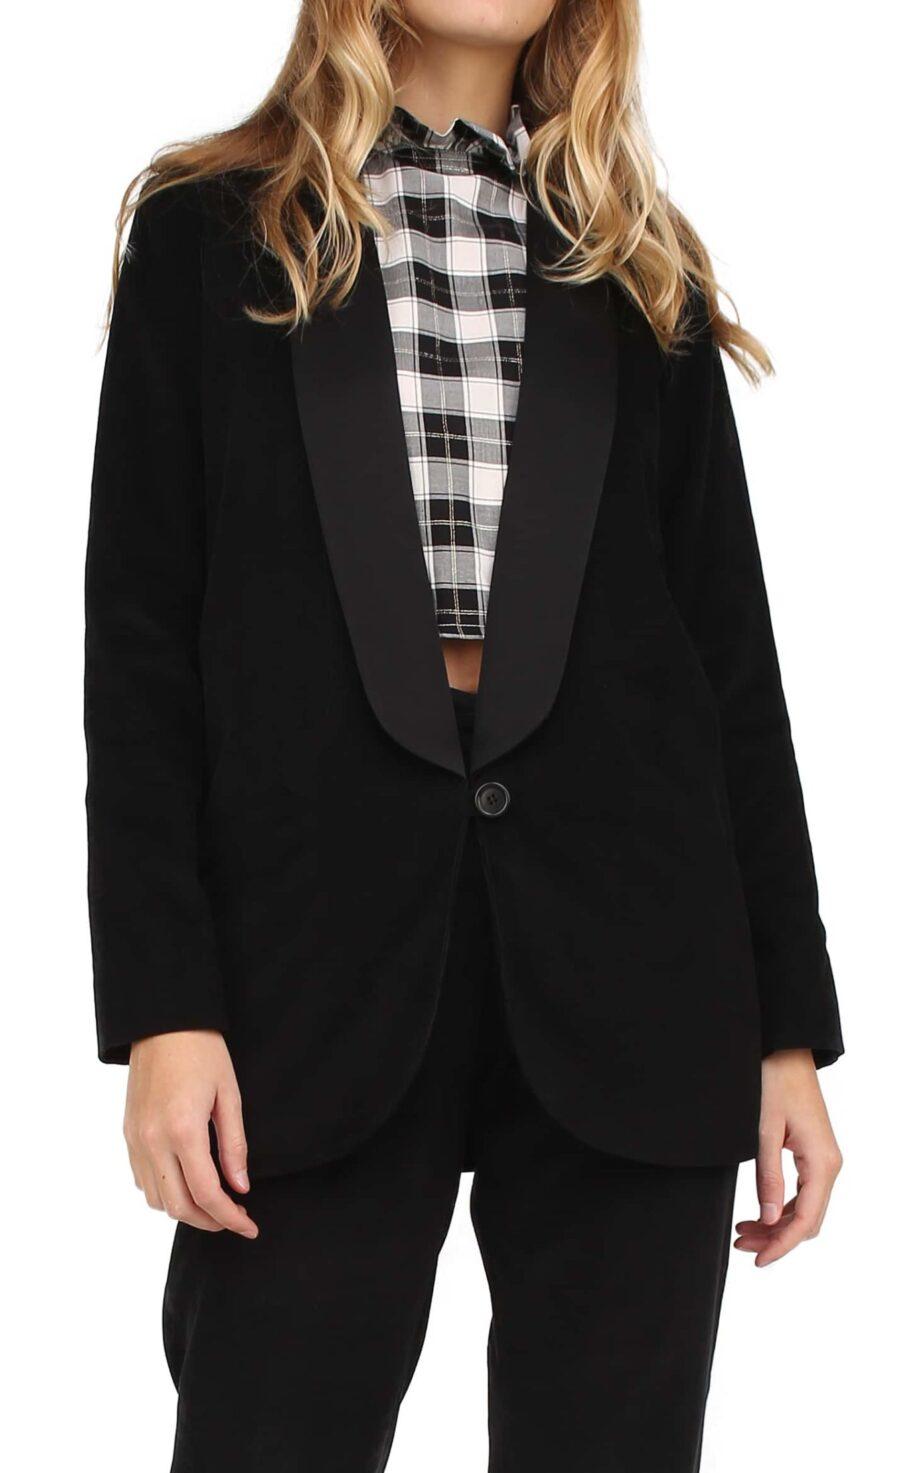 Savana Jacket Black thin corduroy